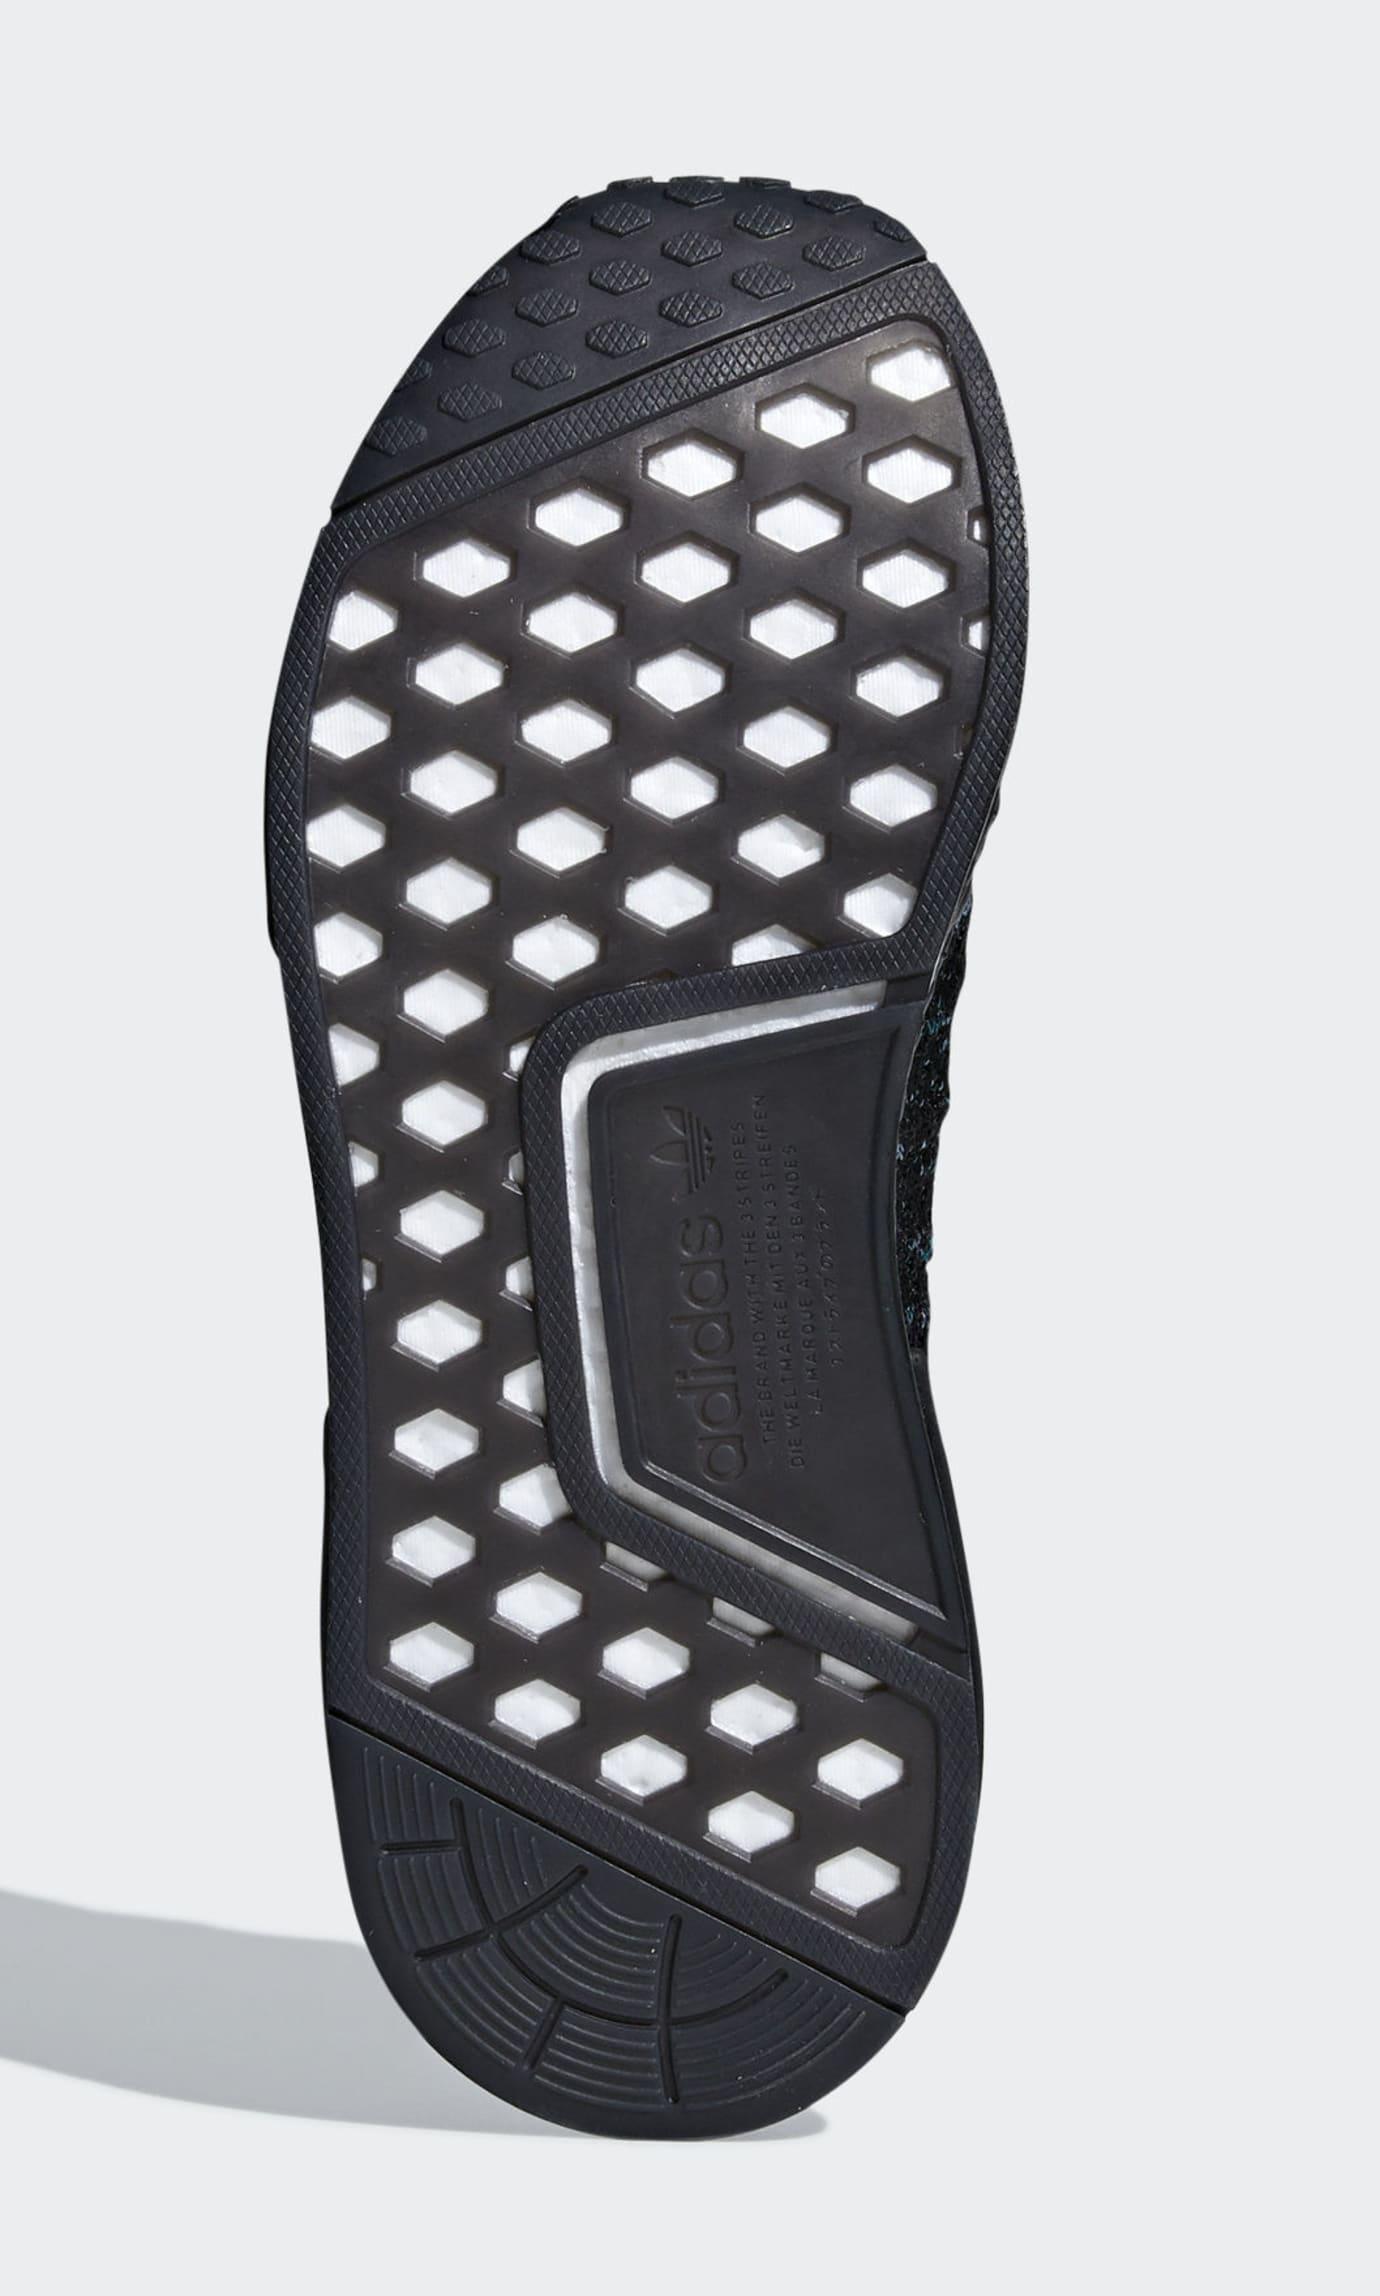 parley-adidas-nmd-r1-core-black-blue-spirit-aq0943-sole